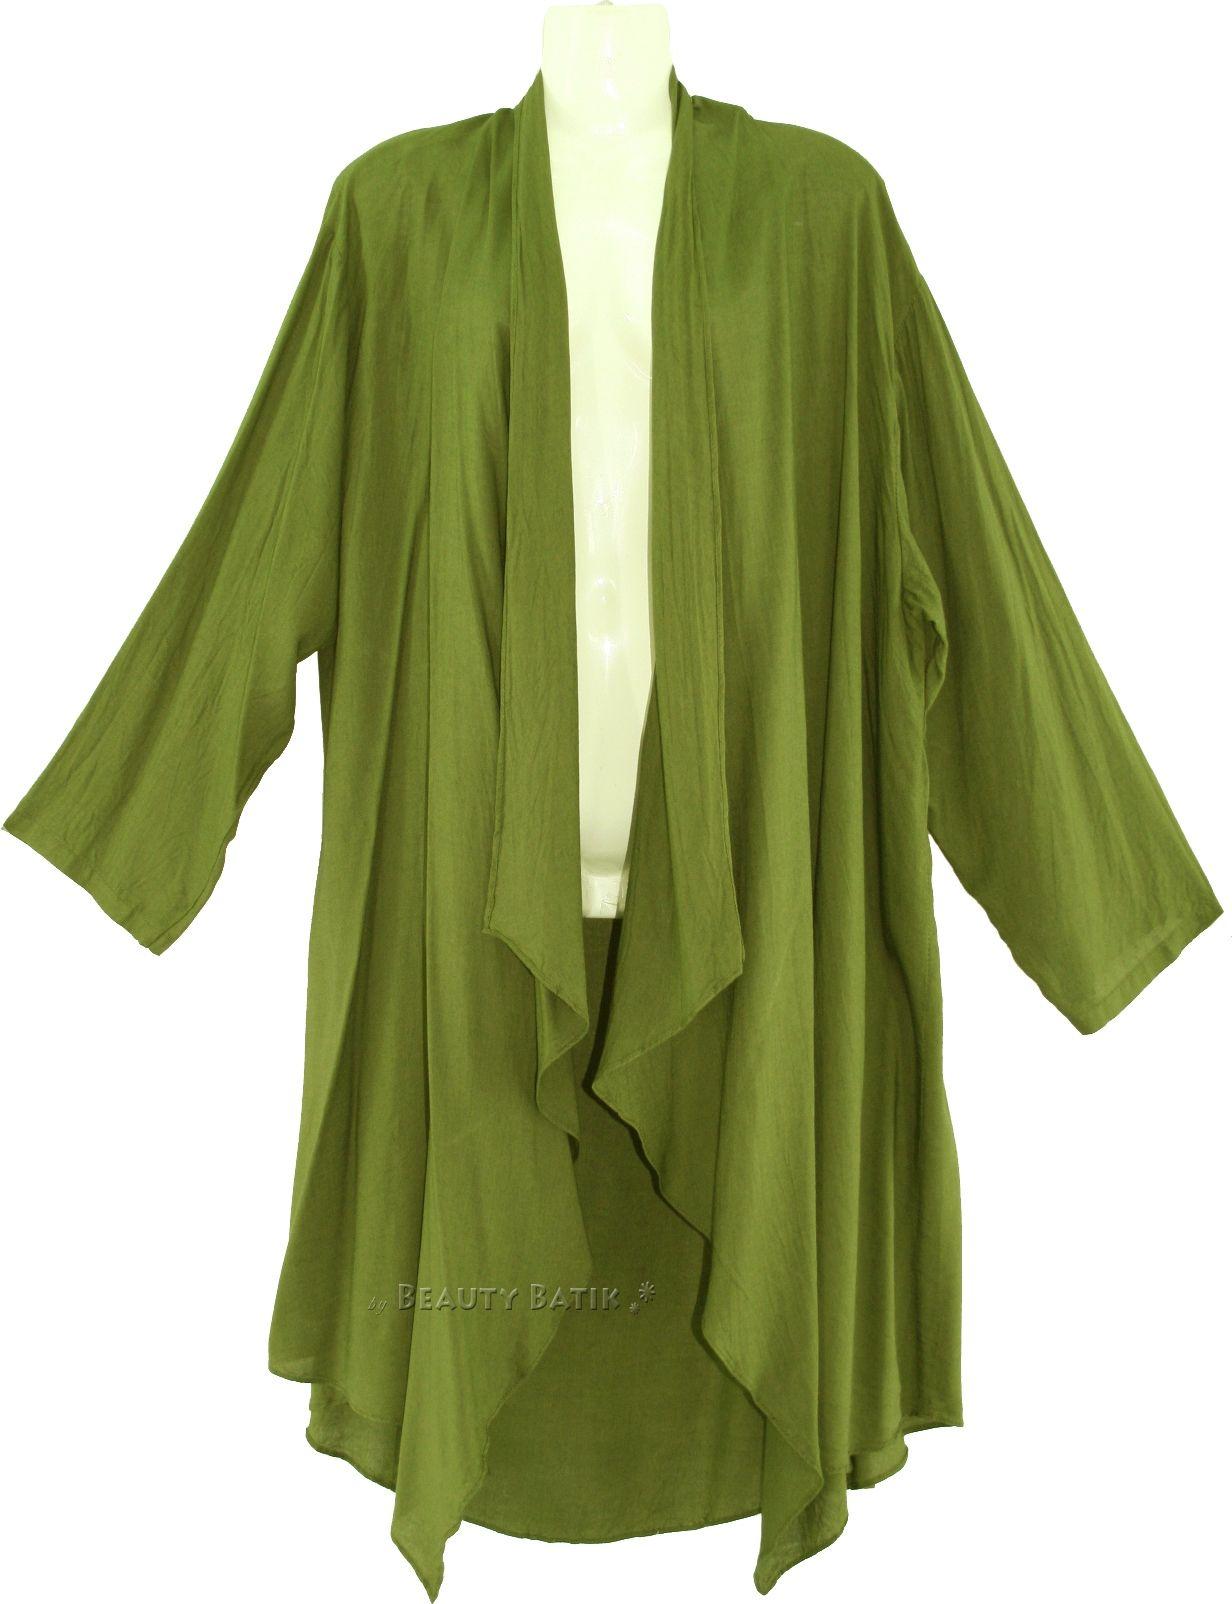 Details about Women Lagenlook Duster Plus Size Long Coverup Jacket ...